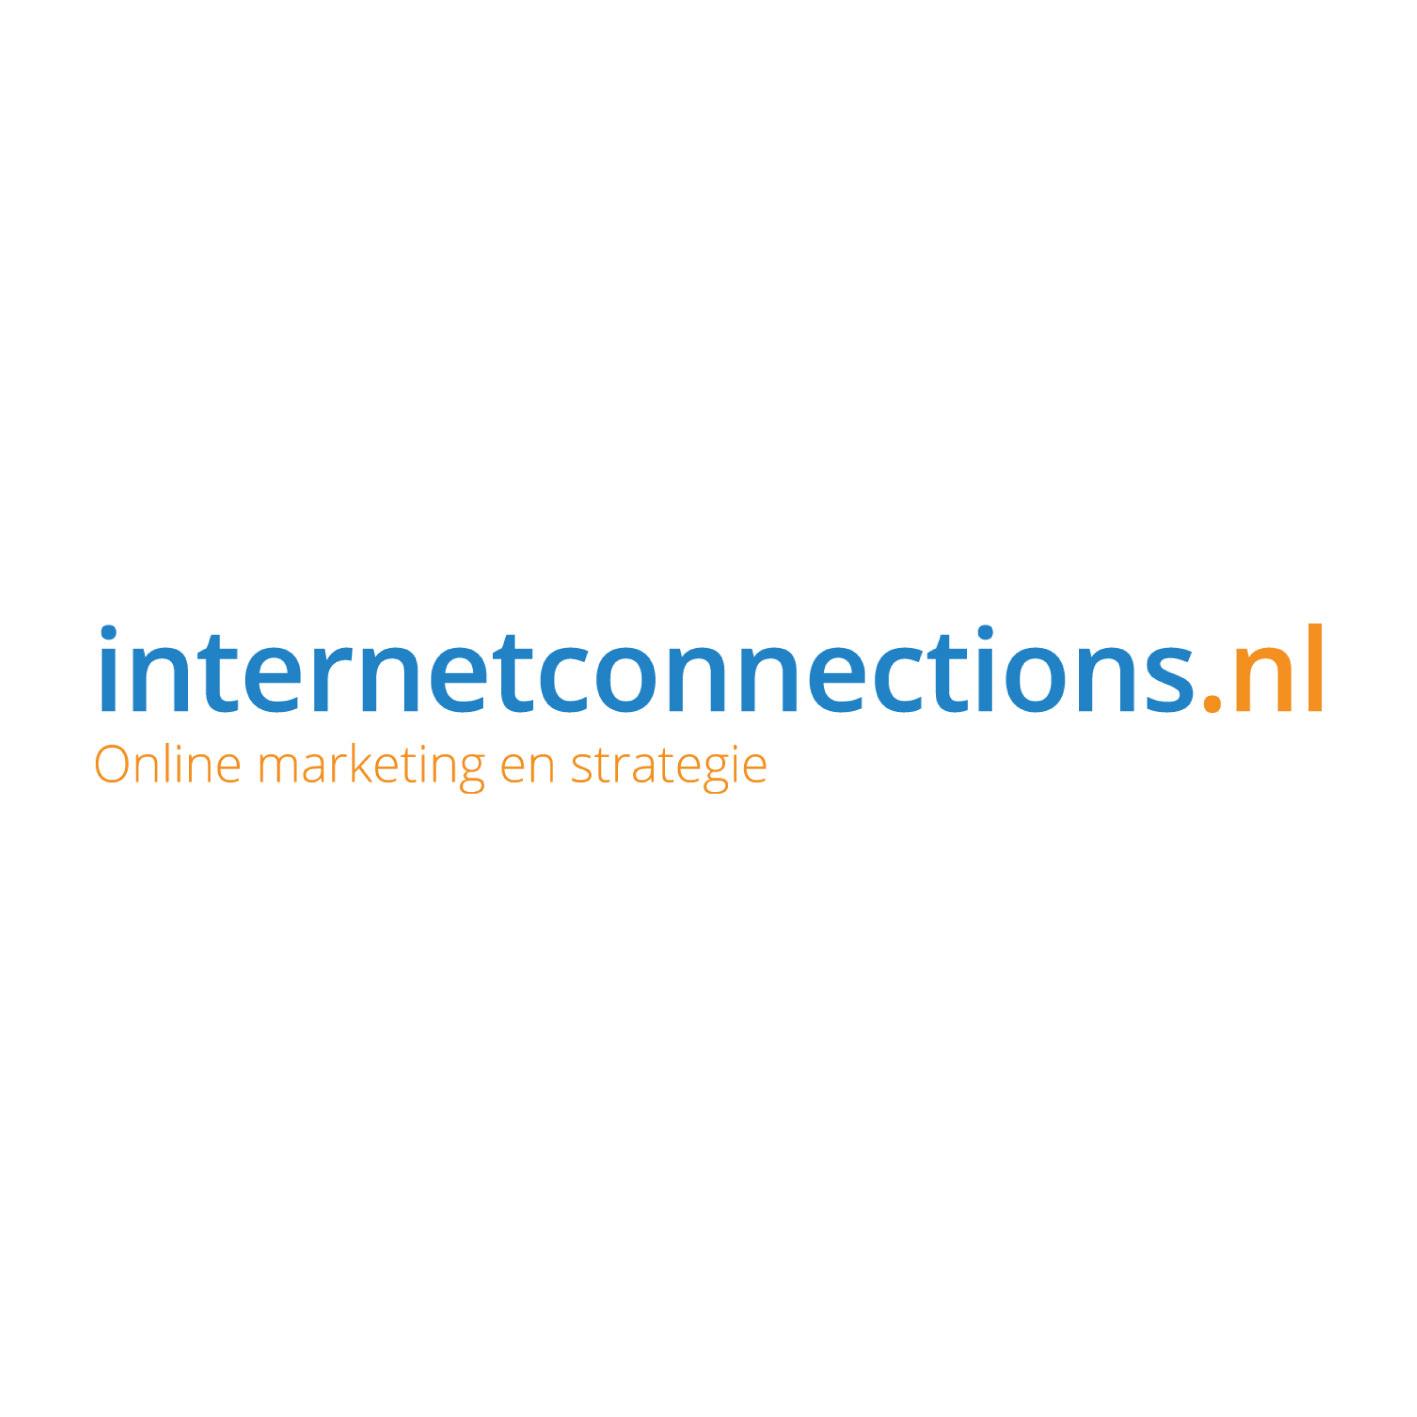 Internetconnections